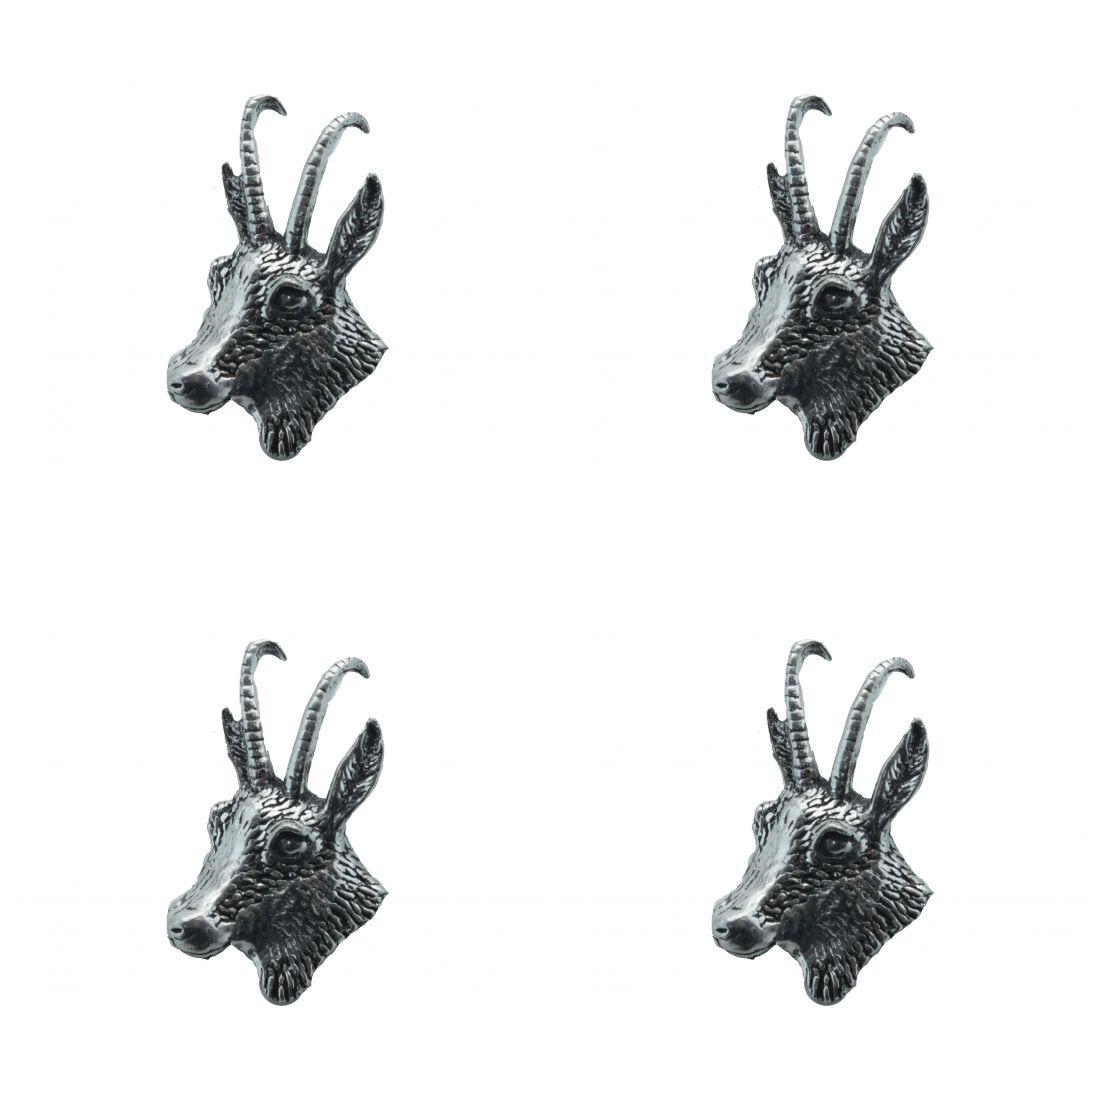 4x Pin Anstecker Badge Gemse links, 2x3cm